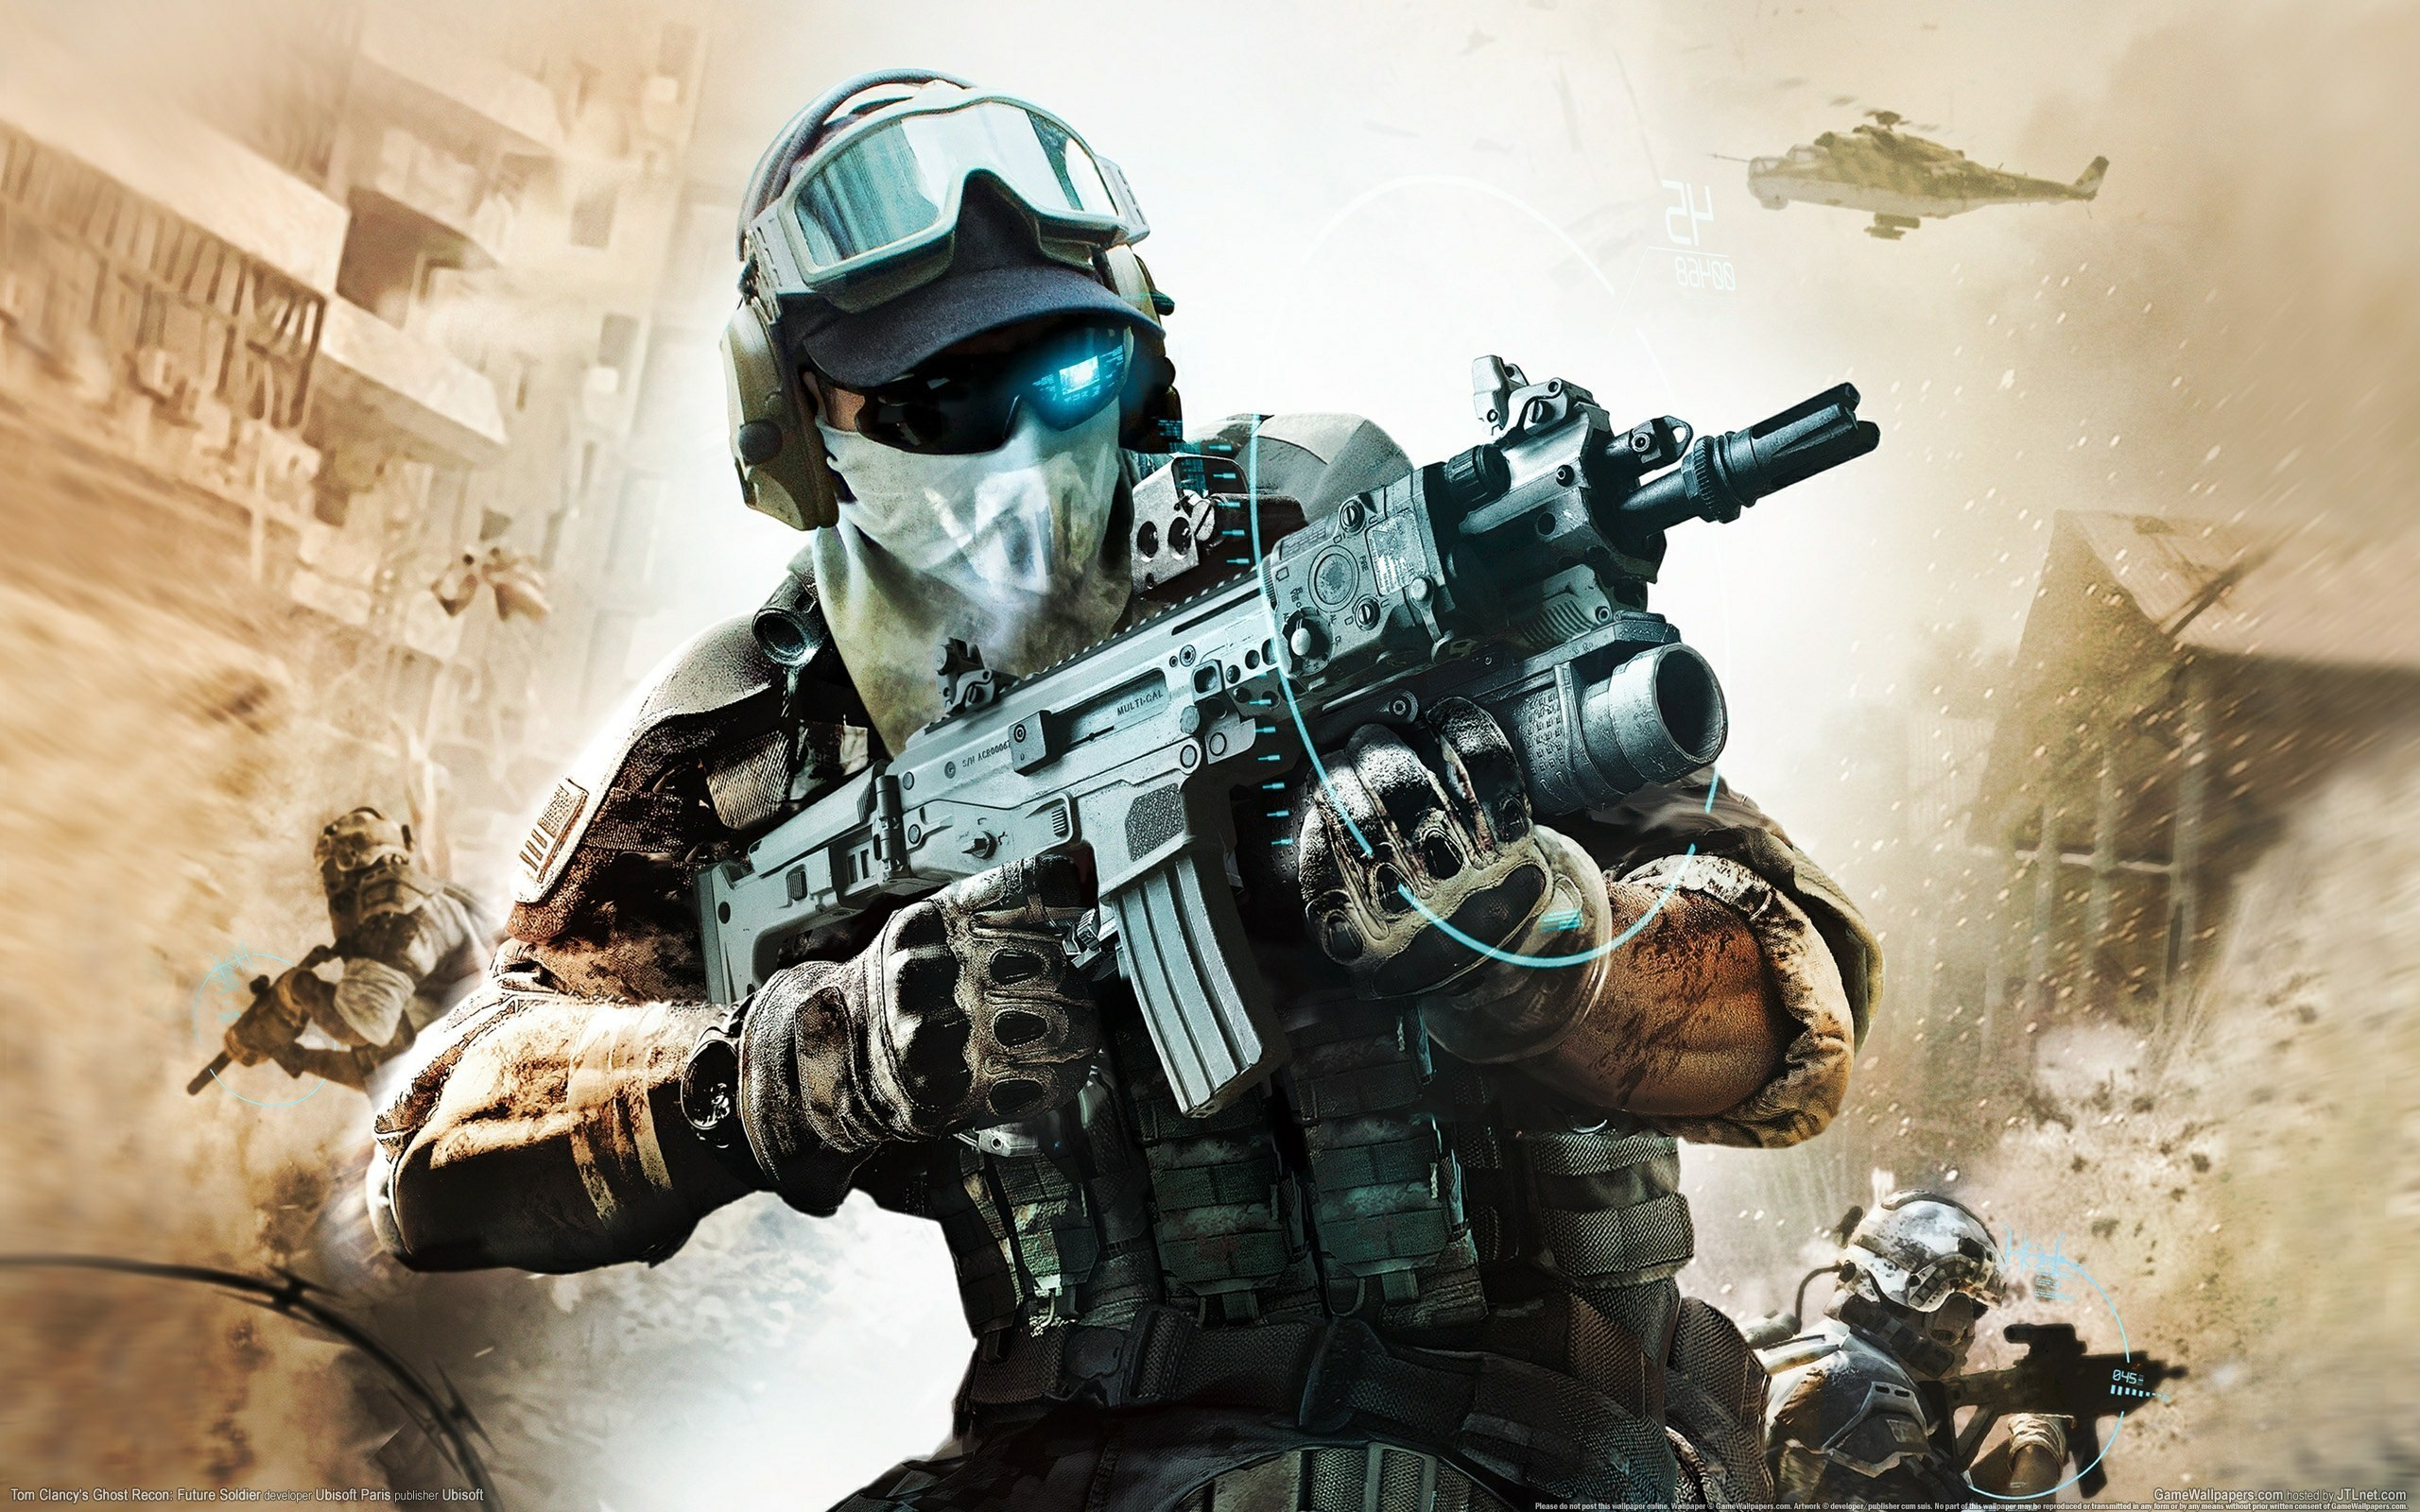 Ghost Recon Future Soldier #4 by DarkApp